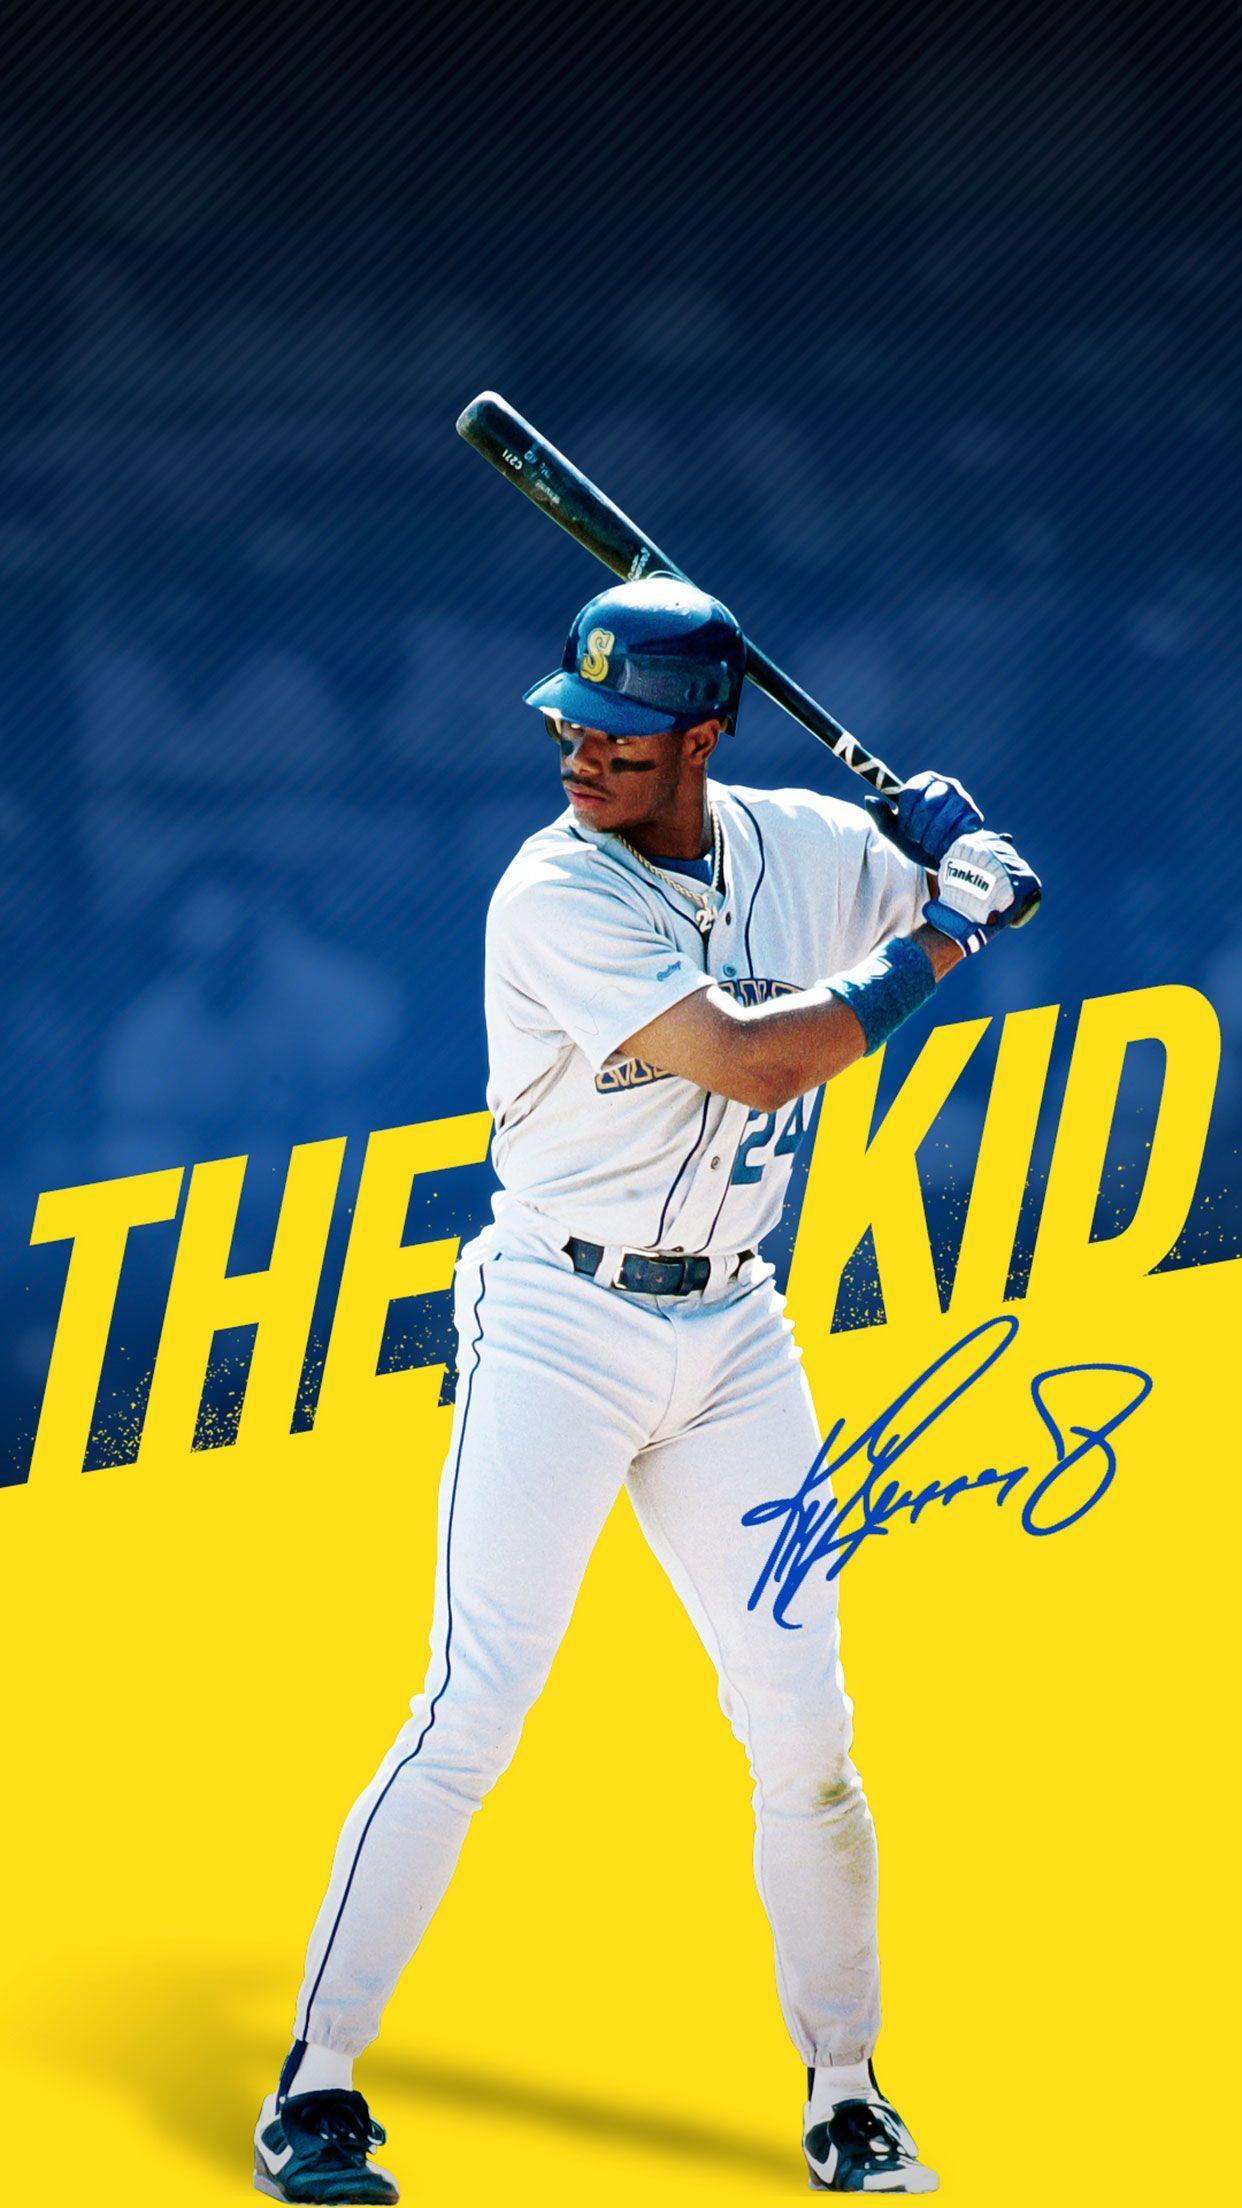 Baseball Players Wallpapers Top Free Baseball Players